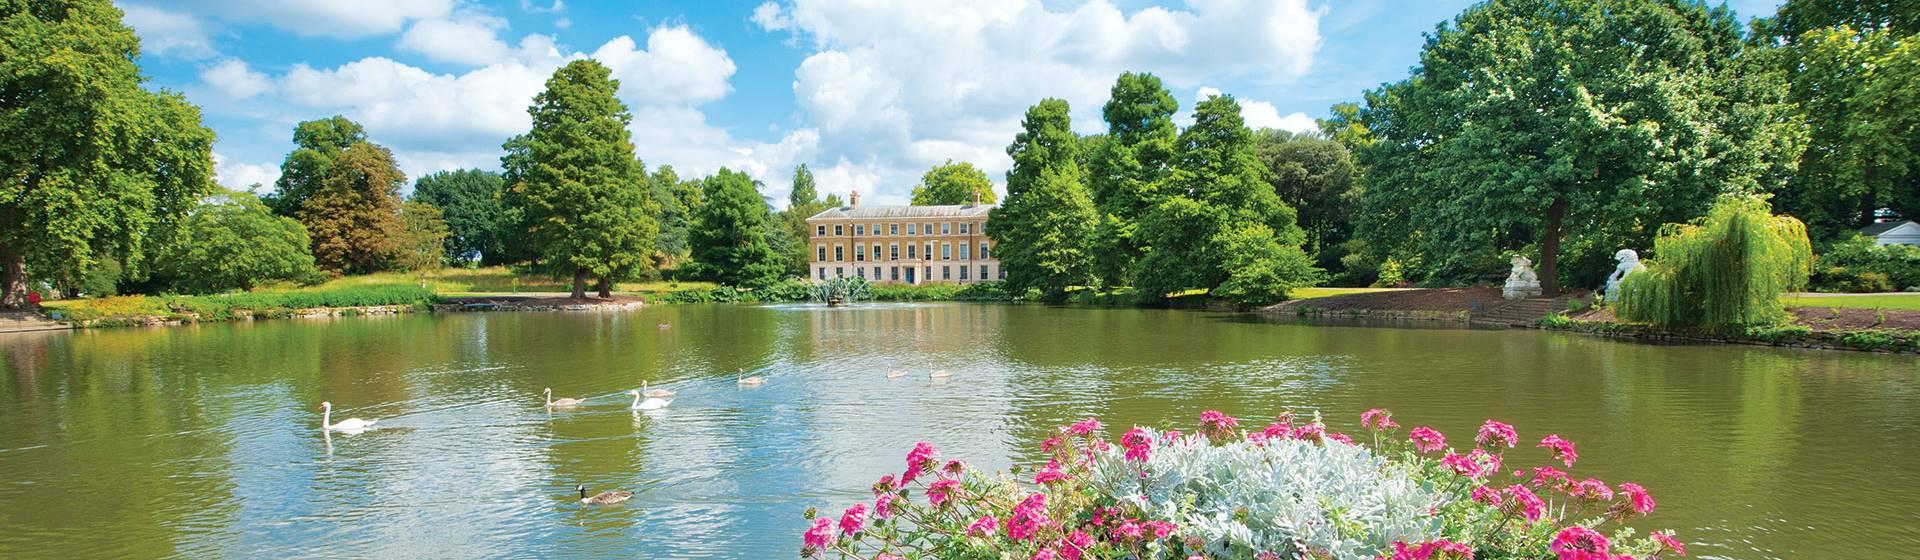 Summertime at Kew Gardens